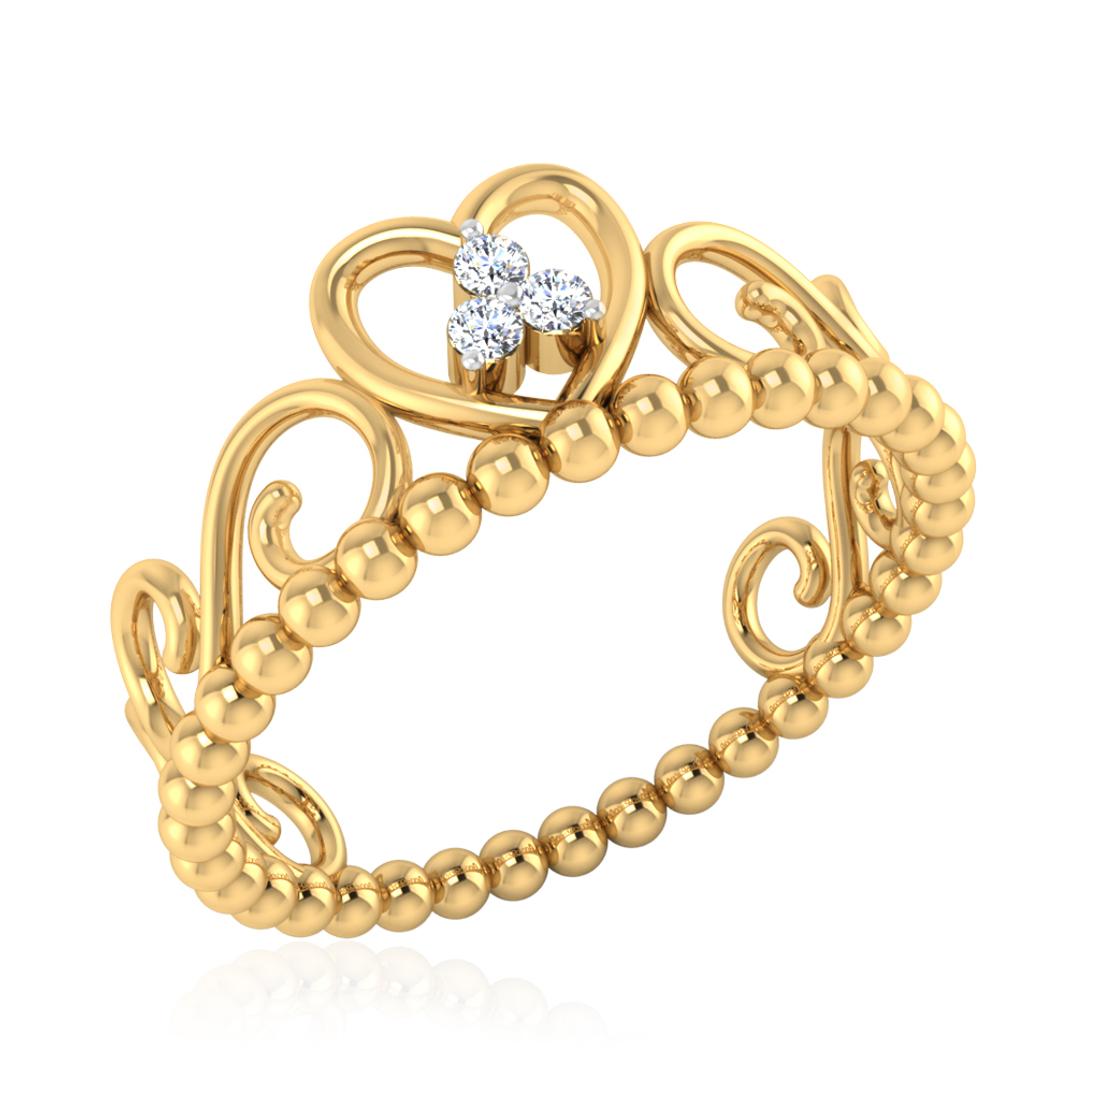 Iski Uski Enduring Ring